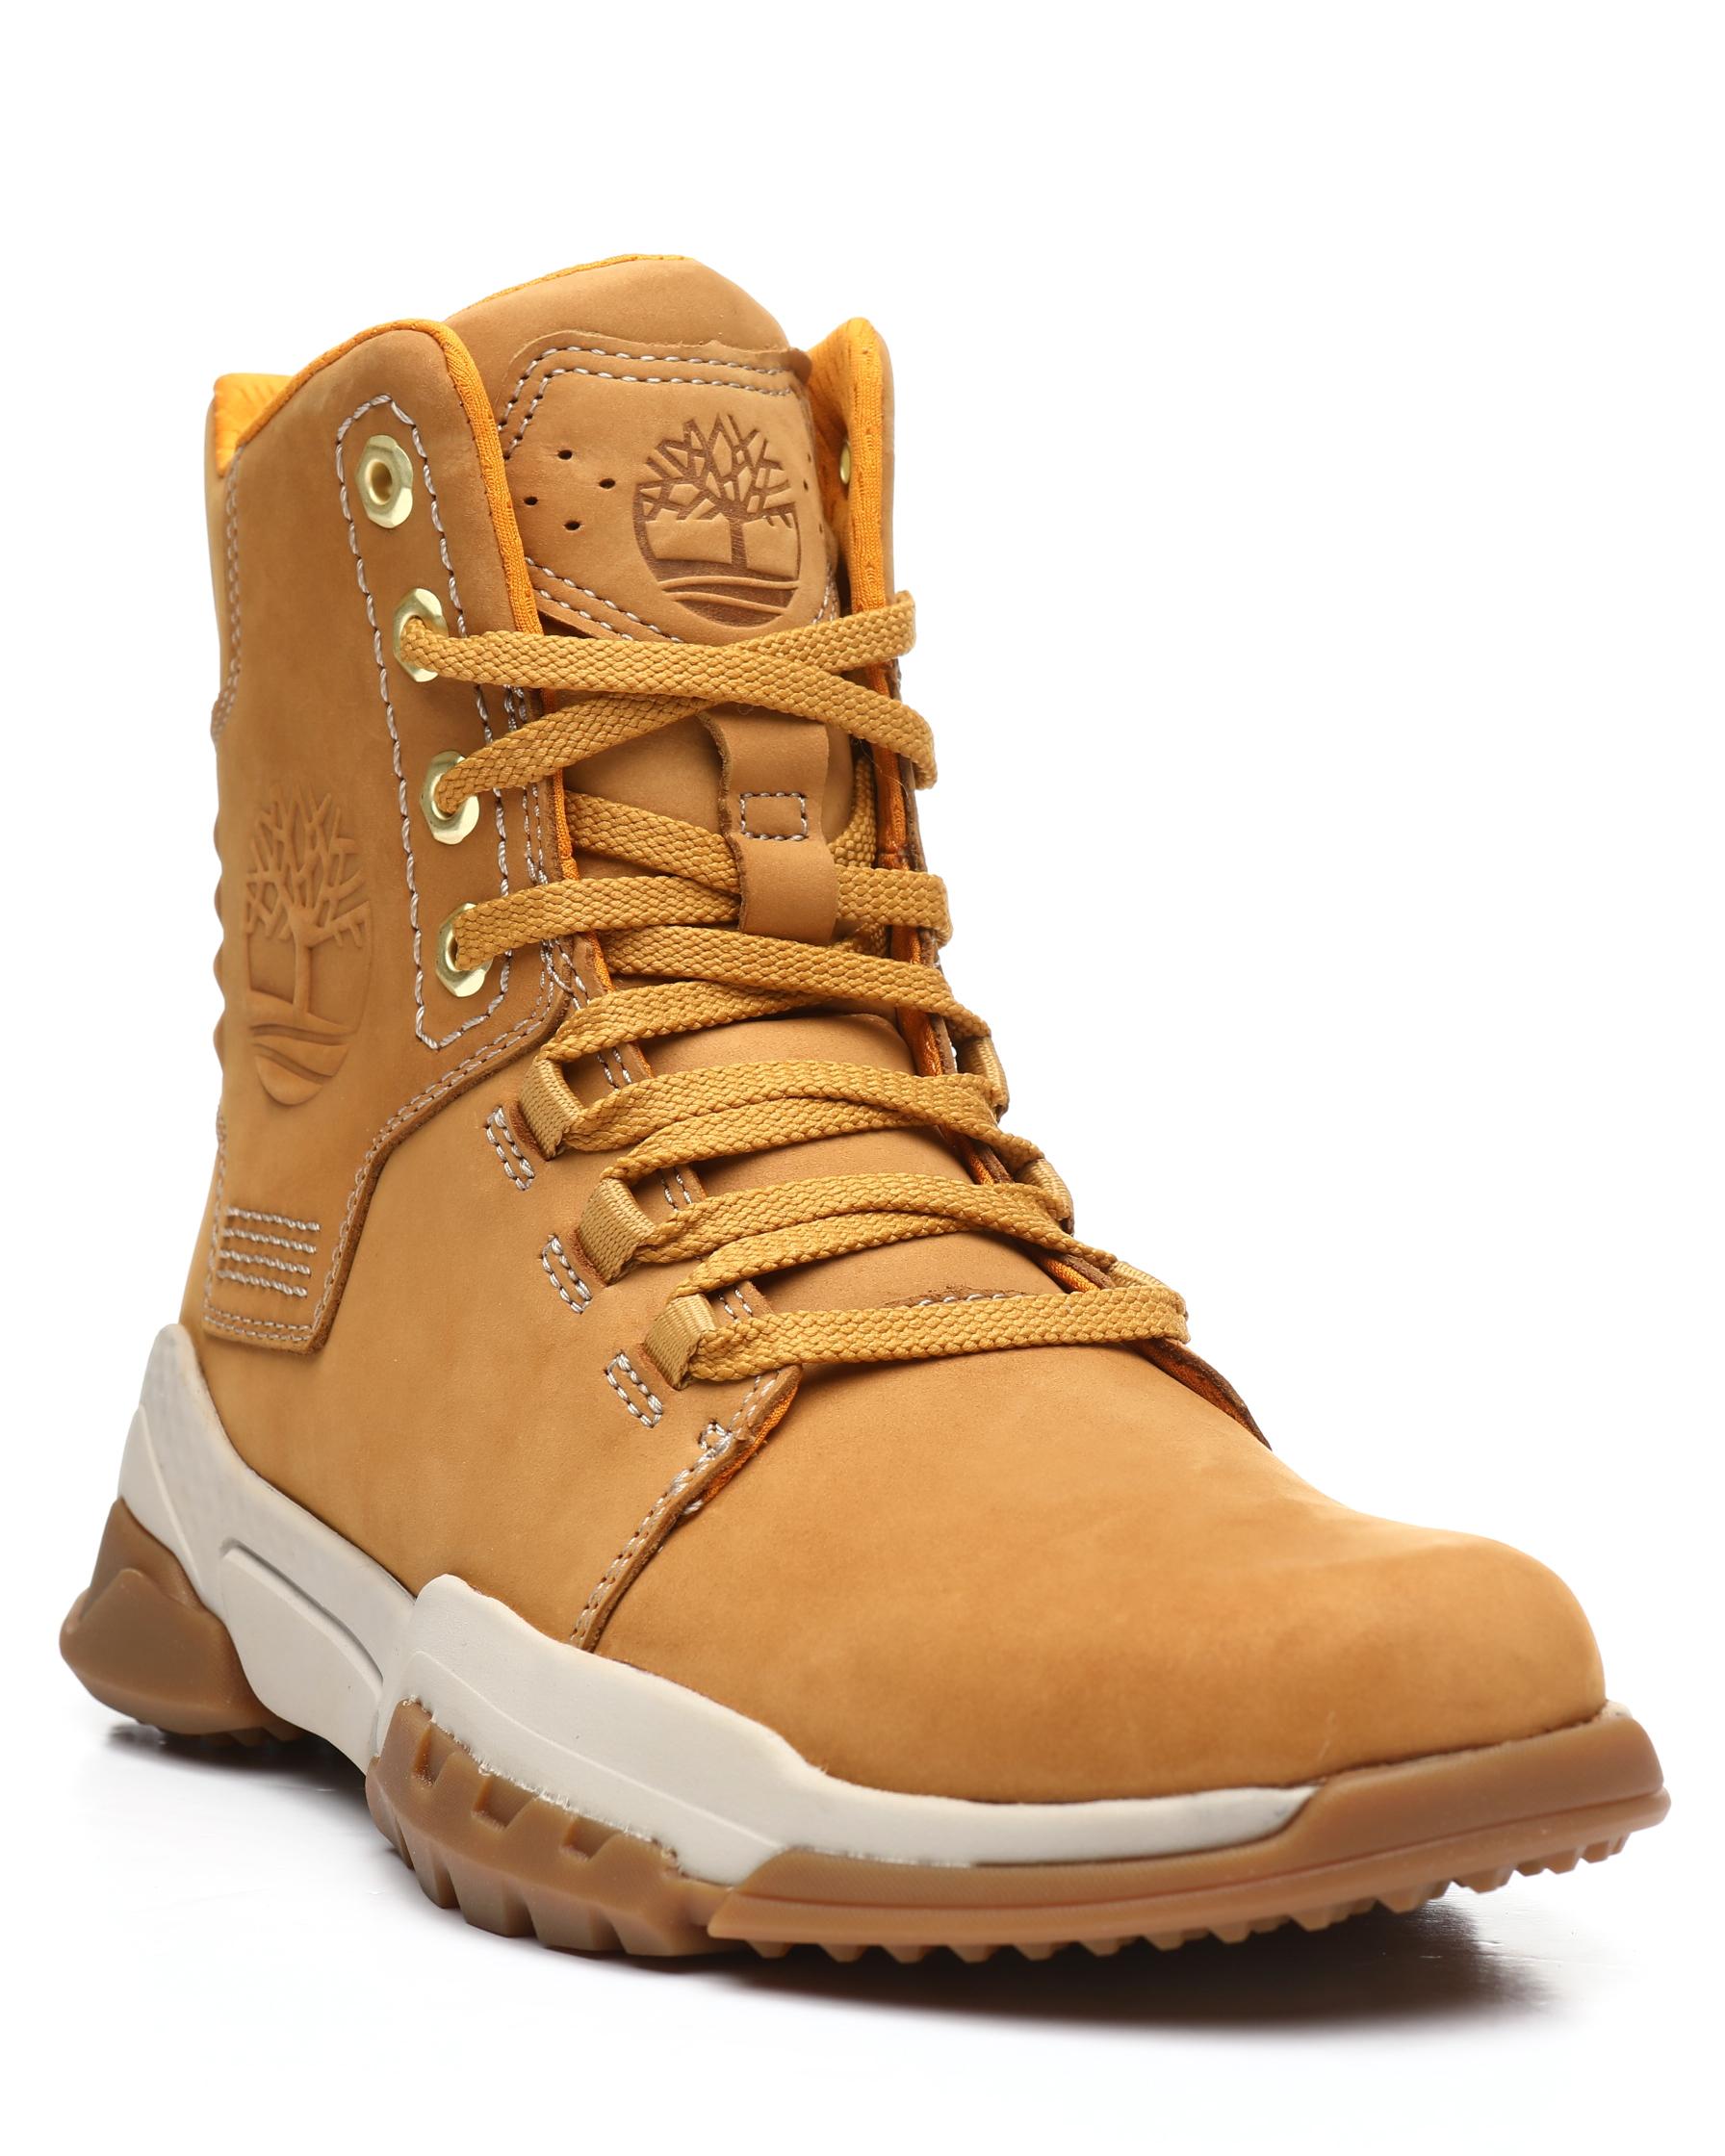 08ea9fb25b6 Buy Special Release CityForce Reveal Leather Boots Men's Footwear ...